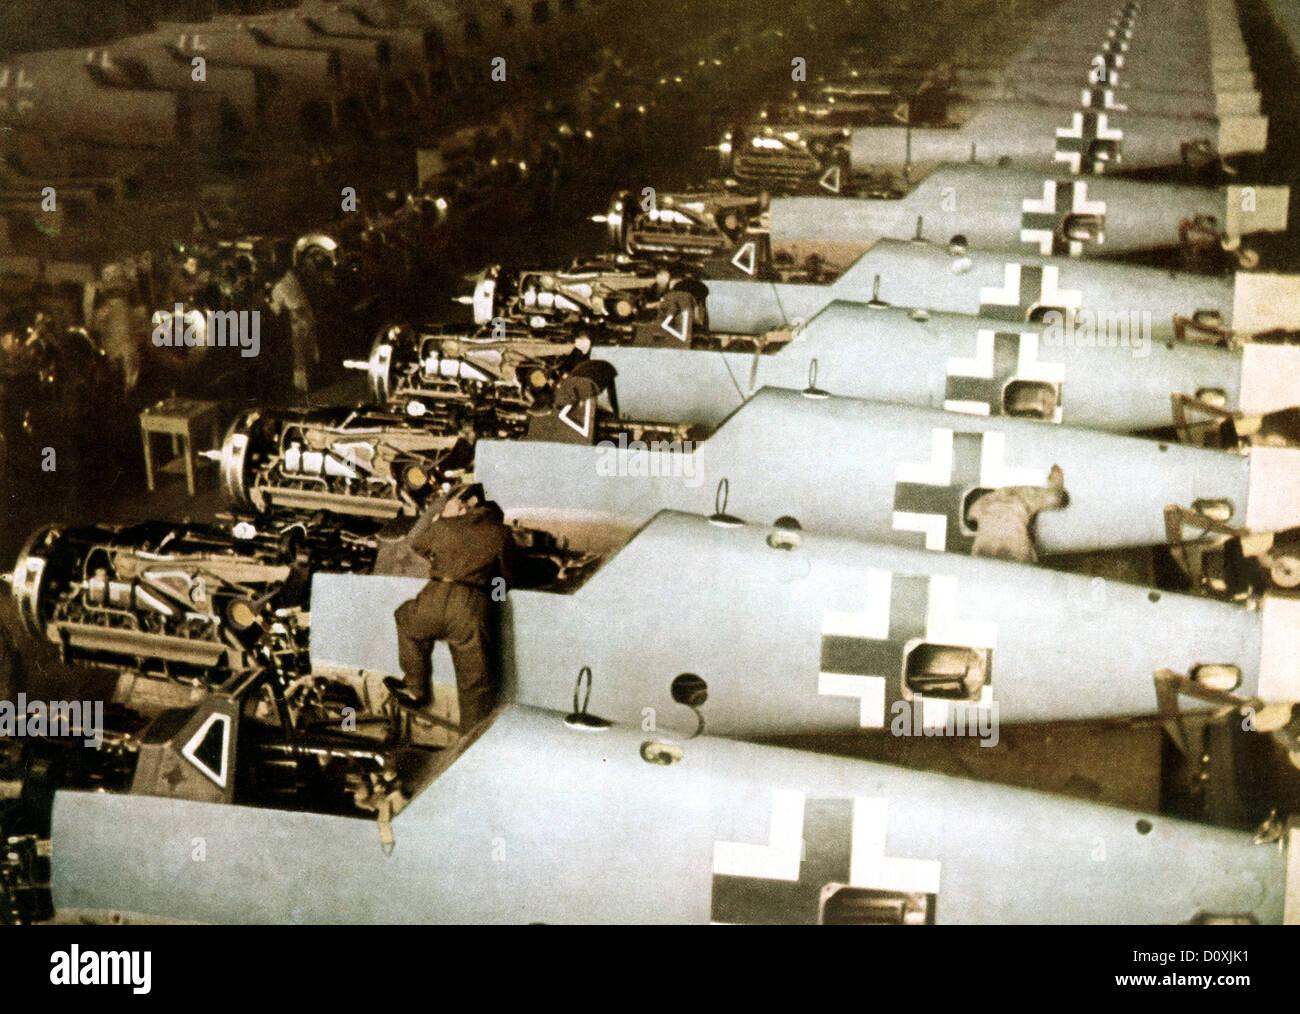 Messerschmitt, Bf 109, Workers, assembly line, airplane, Augsburg, Luftwaffe, World War II, Germany, 1943, factory - Stock Image